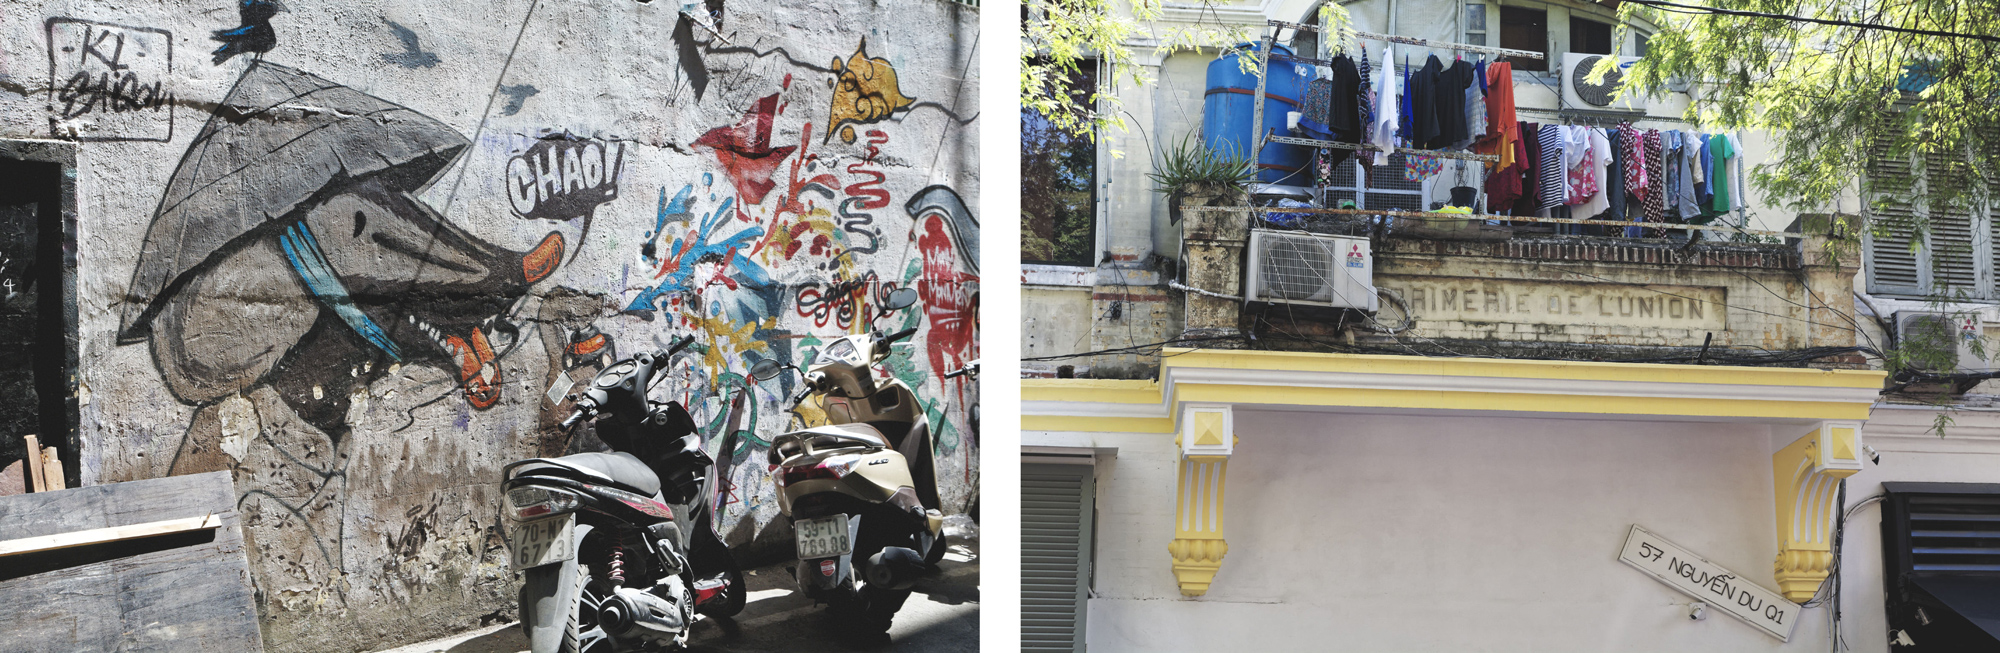 Street art Hô Chi Minh Ville Saigon